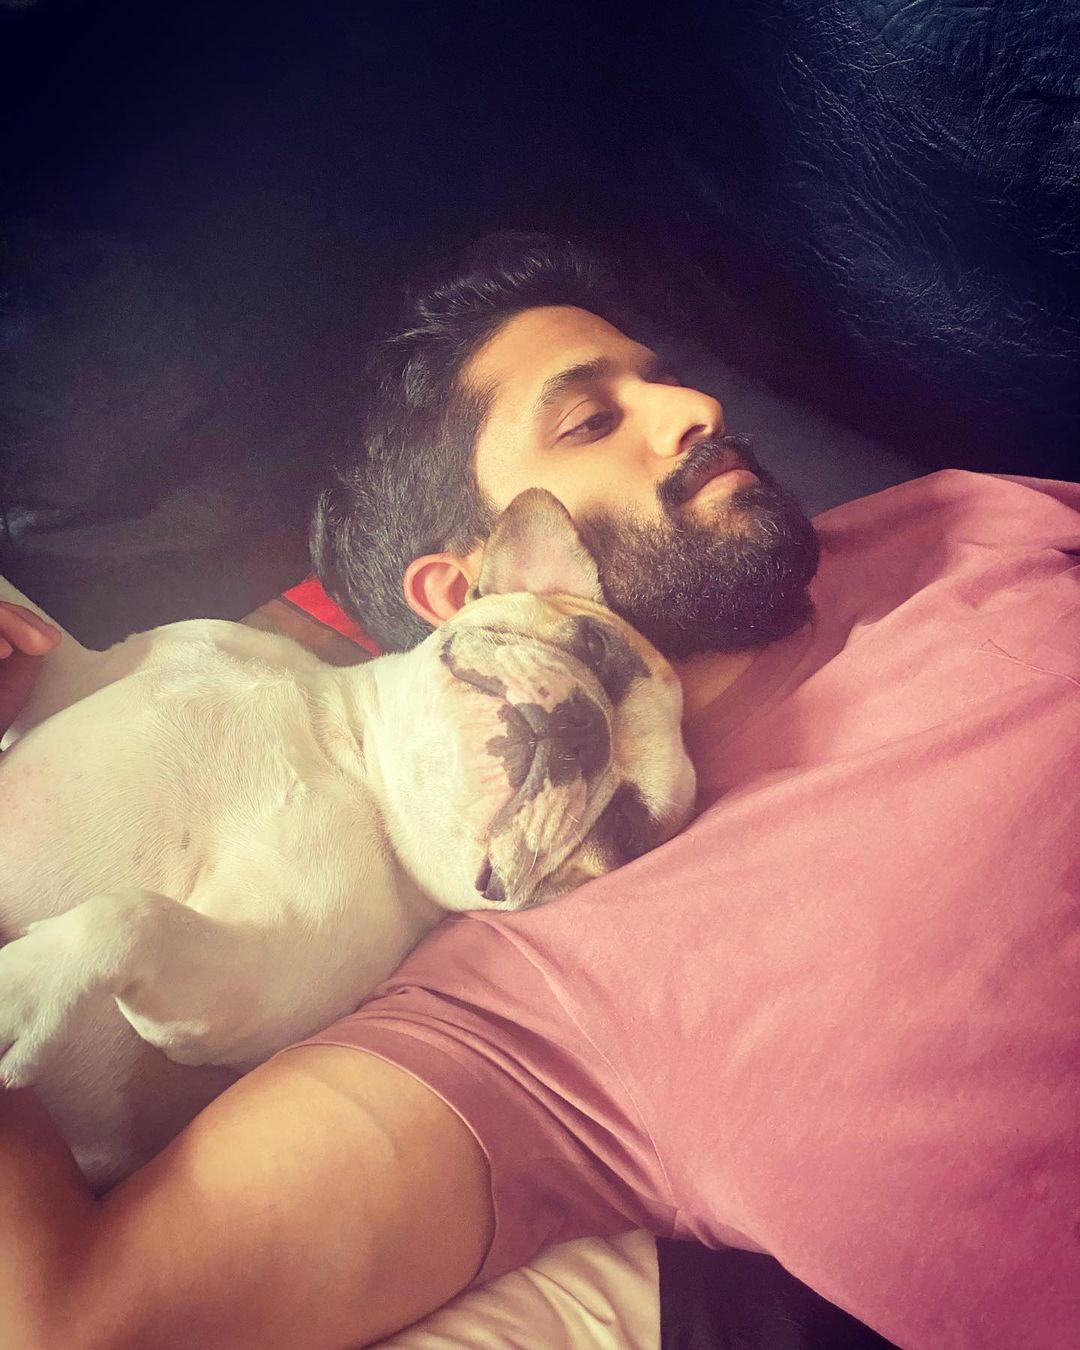 naga chaitanya,love story,love story promotions,hash akkineni,samantha akkineni,lovey moments,pet dog hash,national pets day  హాష్ అక్కినేనితో రిలాక్స్ అవుతున్న చైతు